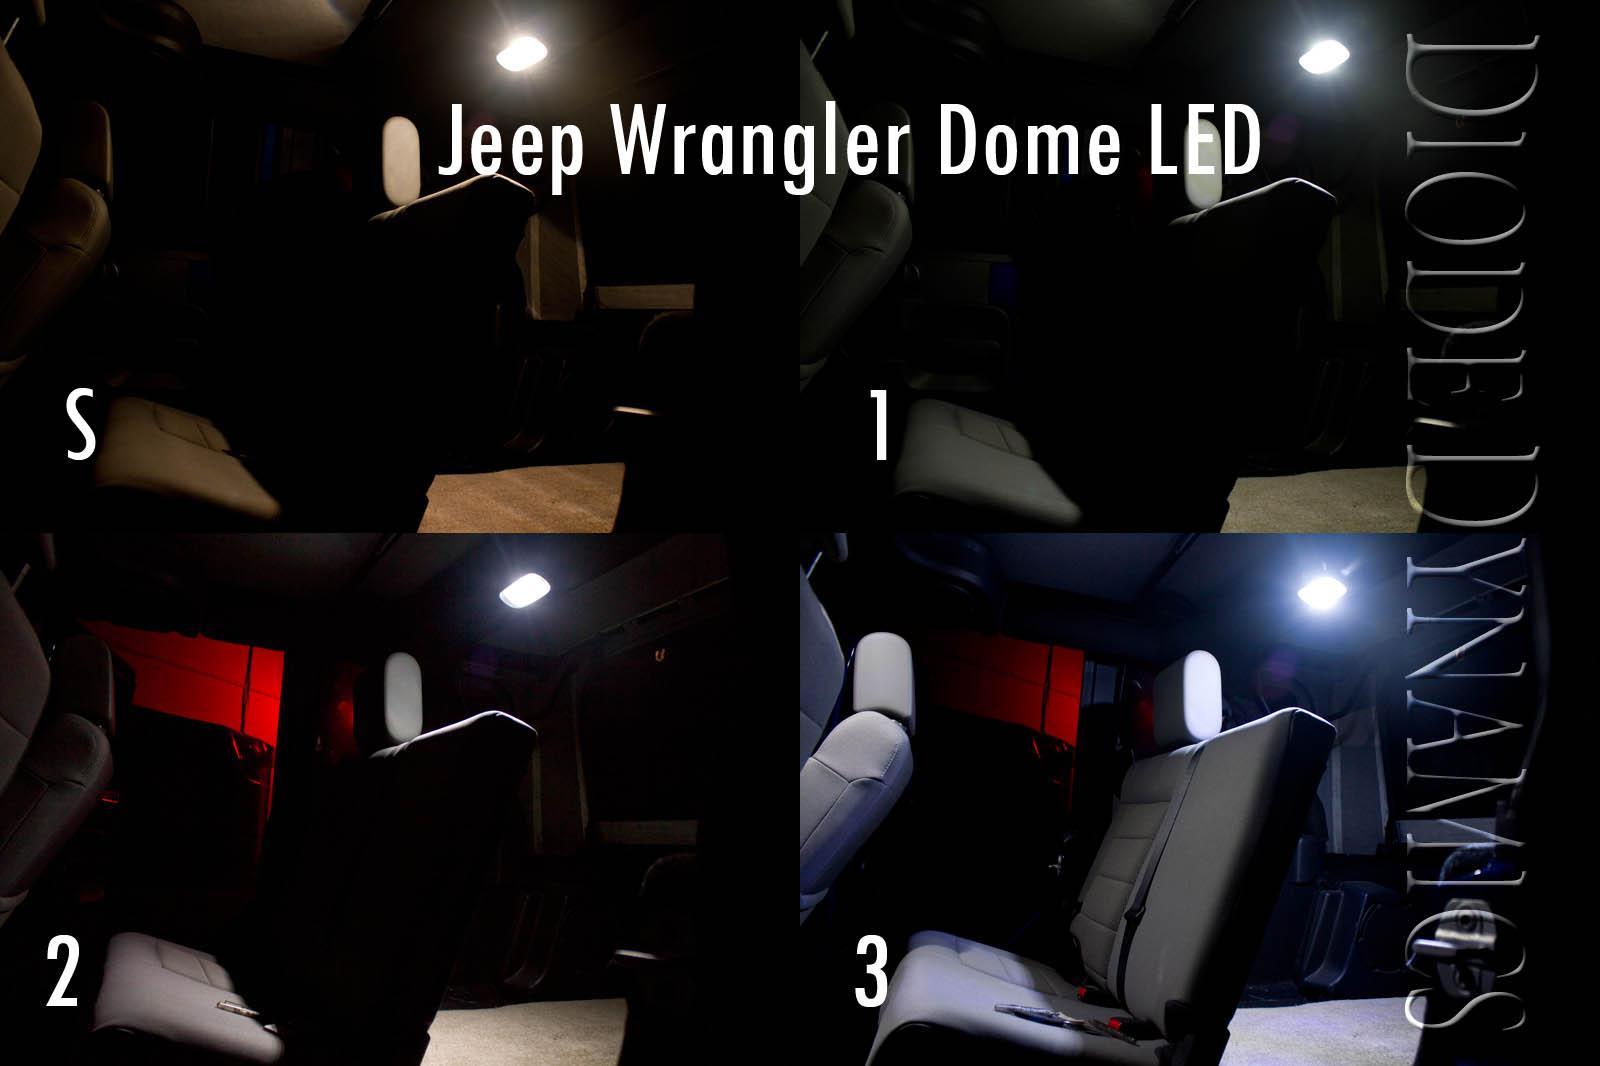 Fs 2010 2012 jk wrangler led conversion kit upgrade your lights great mod jeep wrangler forum for Jeep wrangler interior lighting